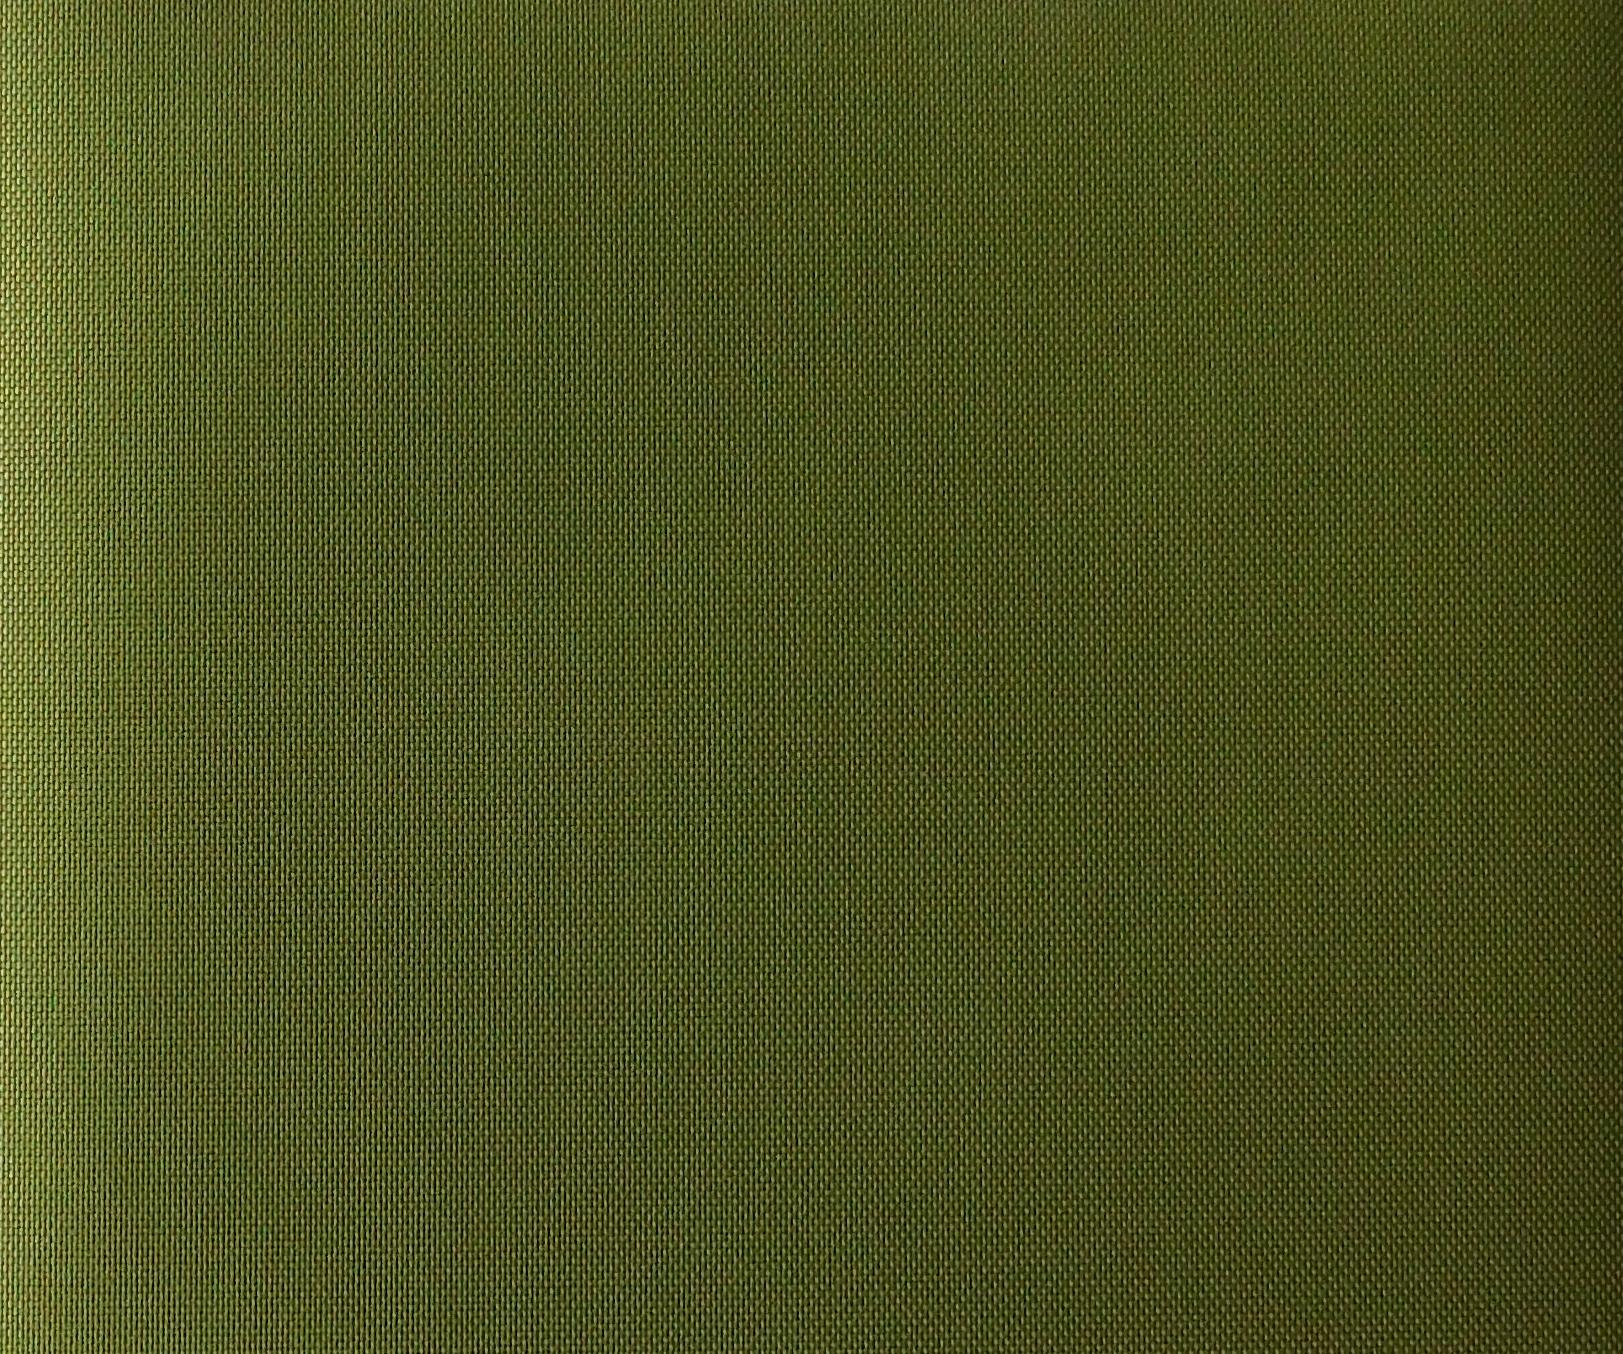 Buy Velux 4567 Olive Green Blinds Online Merit Blinds